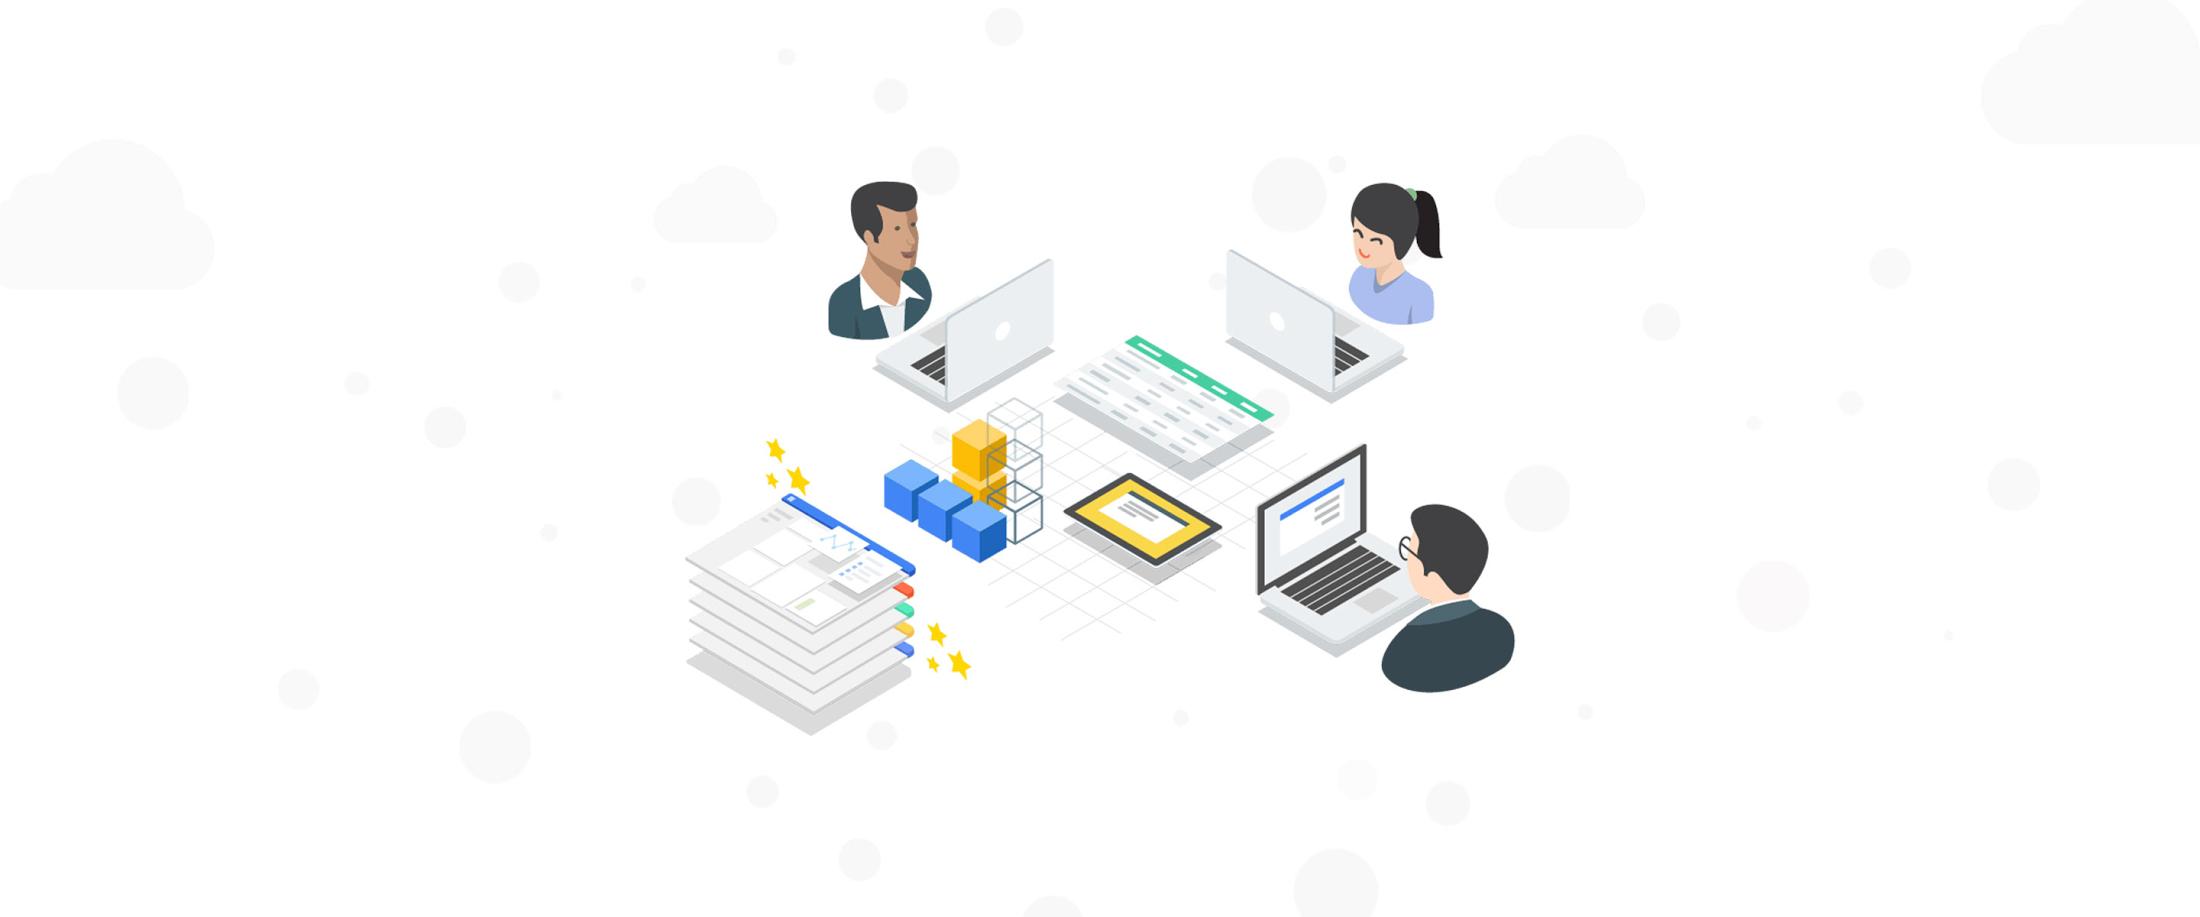 TabNet on AI Platform: High-performance, Explainable Tabular Learning